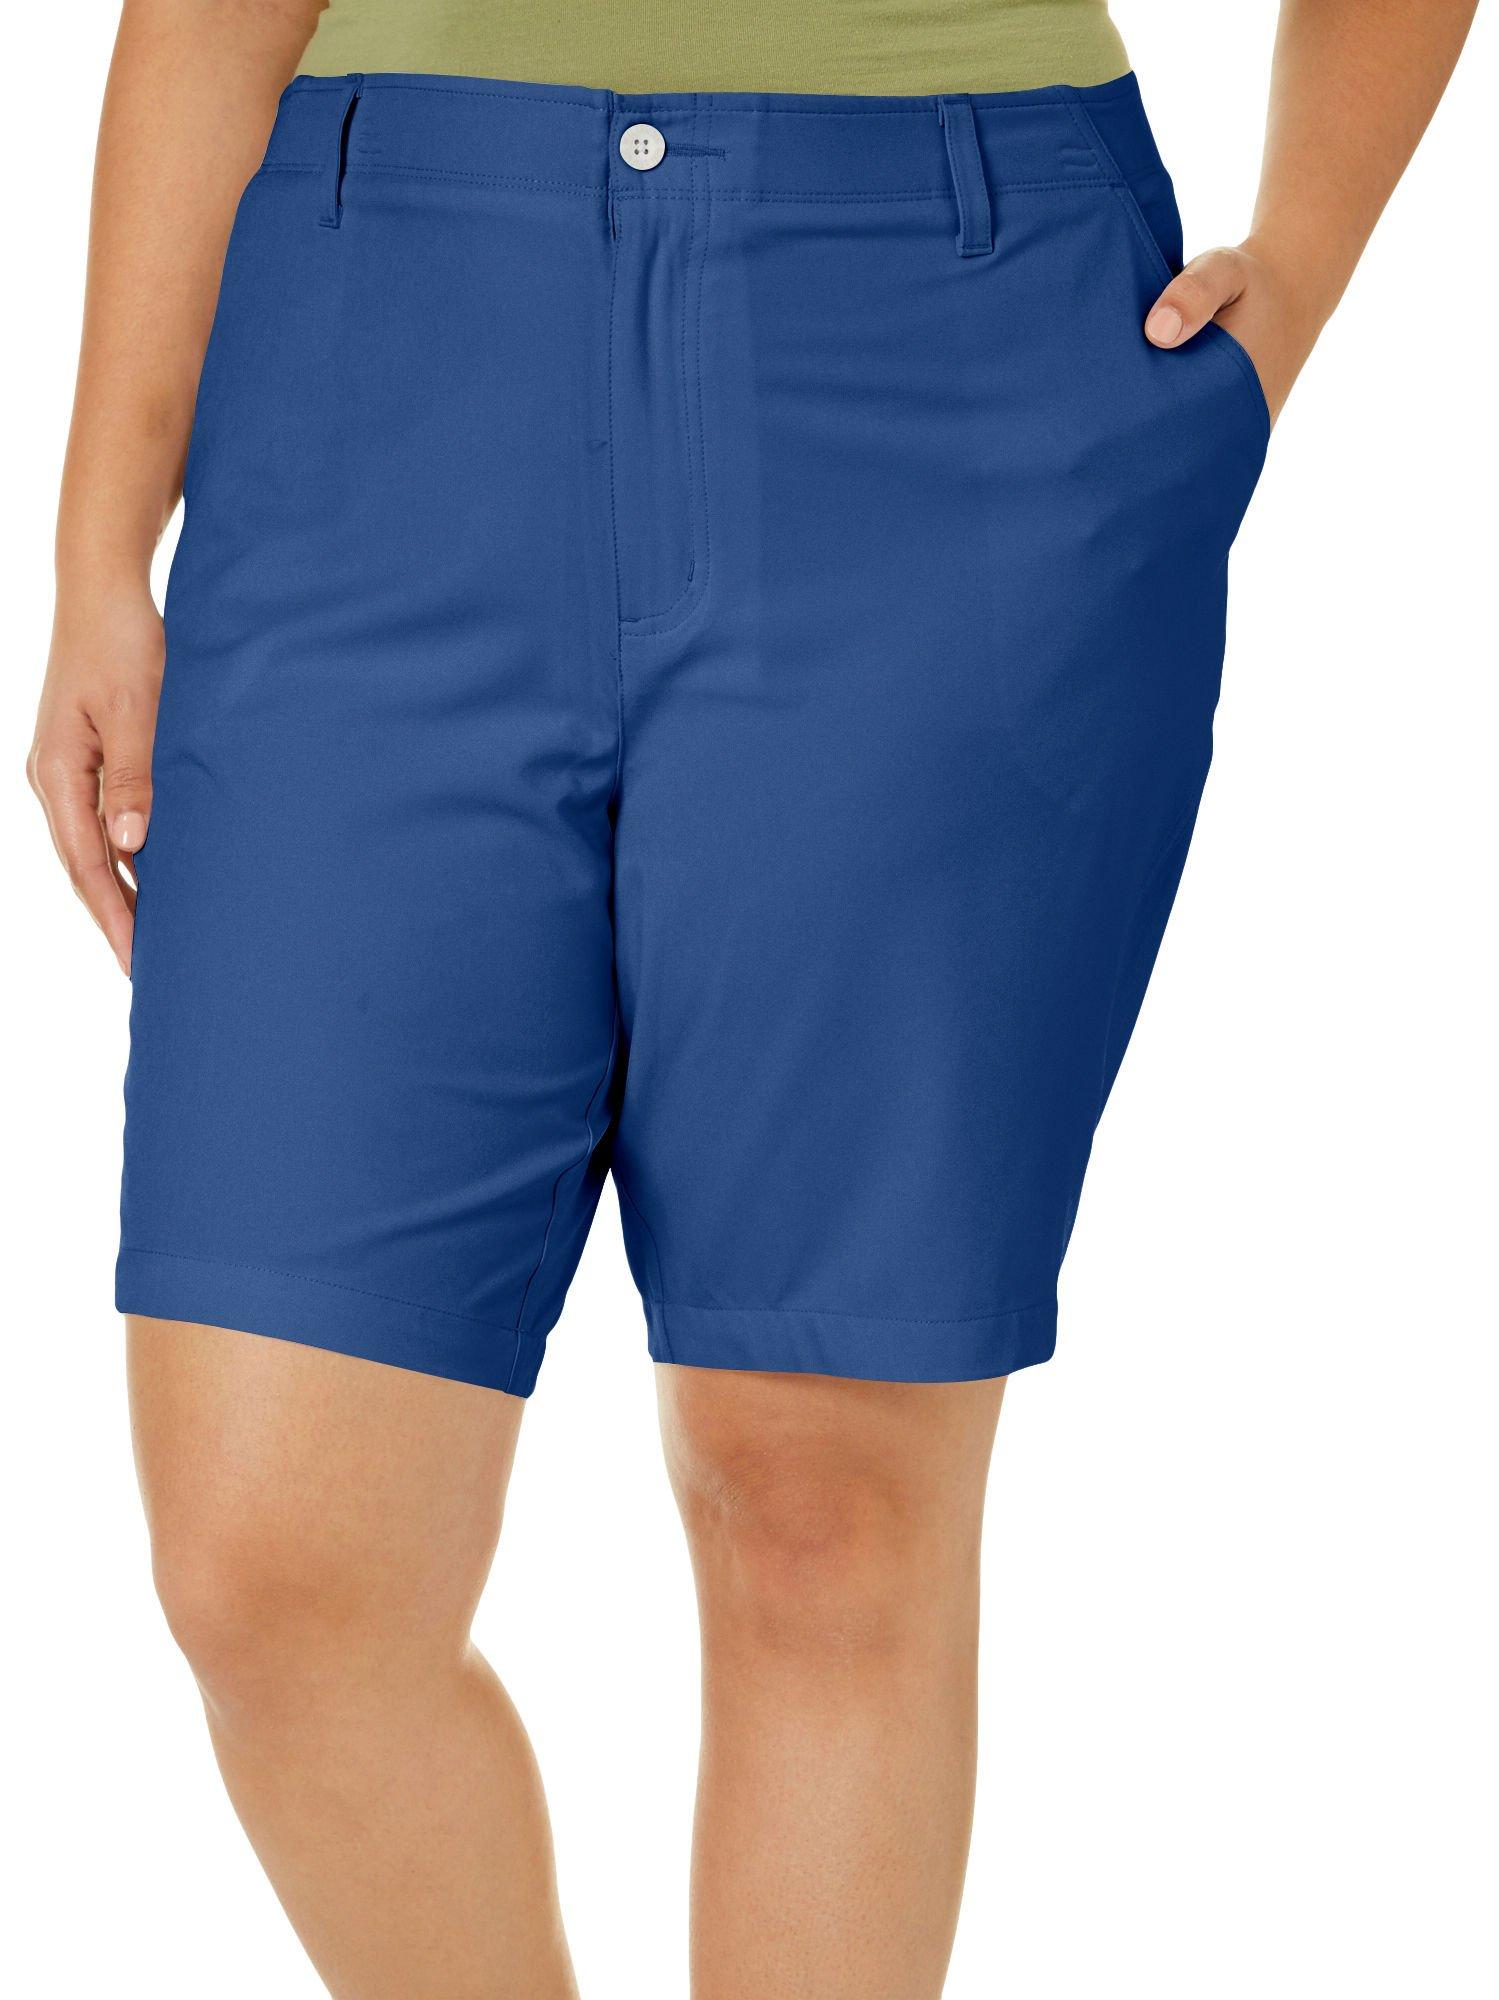 Reel Legends Plus Solid Comfort Waist Bermuda Shorts 20W Estate Blue